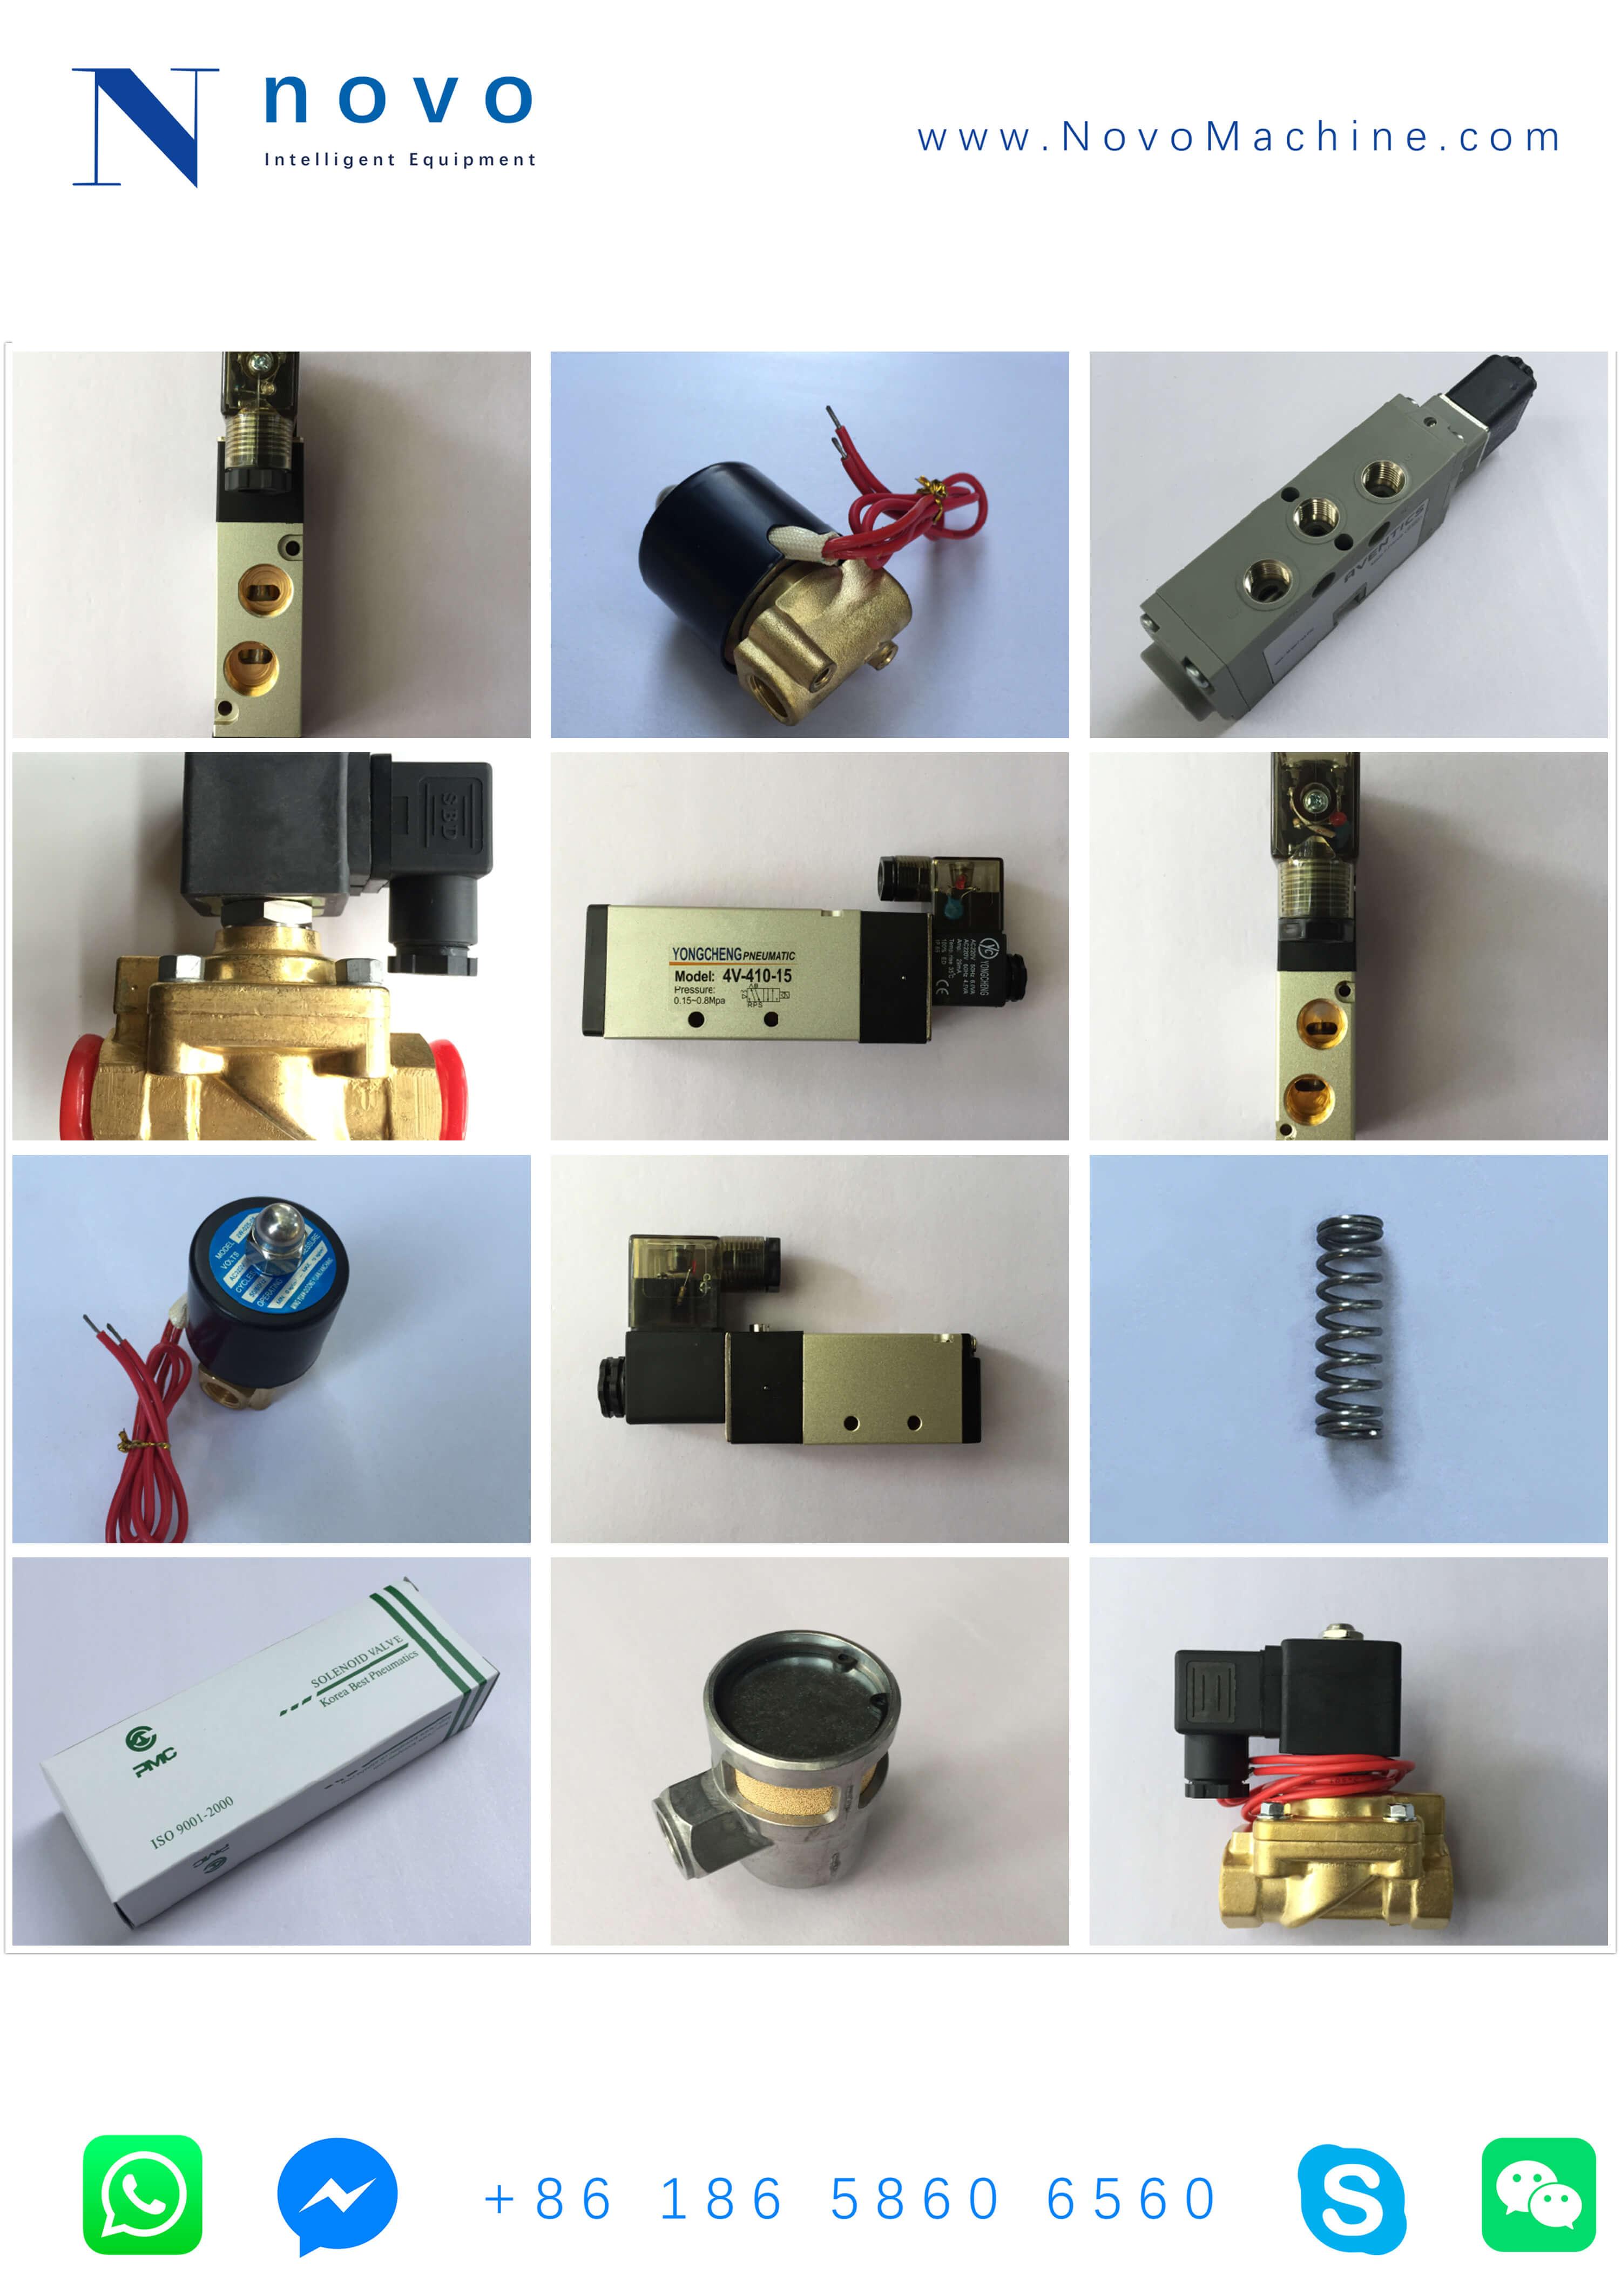 Solenoid-Valve-Spare-parts-for-Novo-PET-bottle-blowing-molding-machine